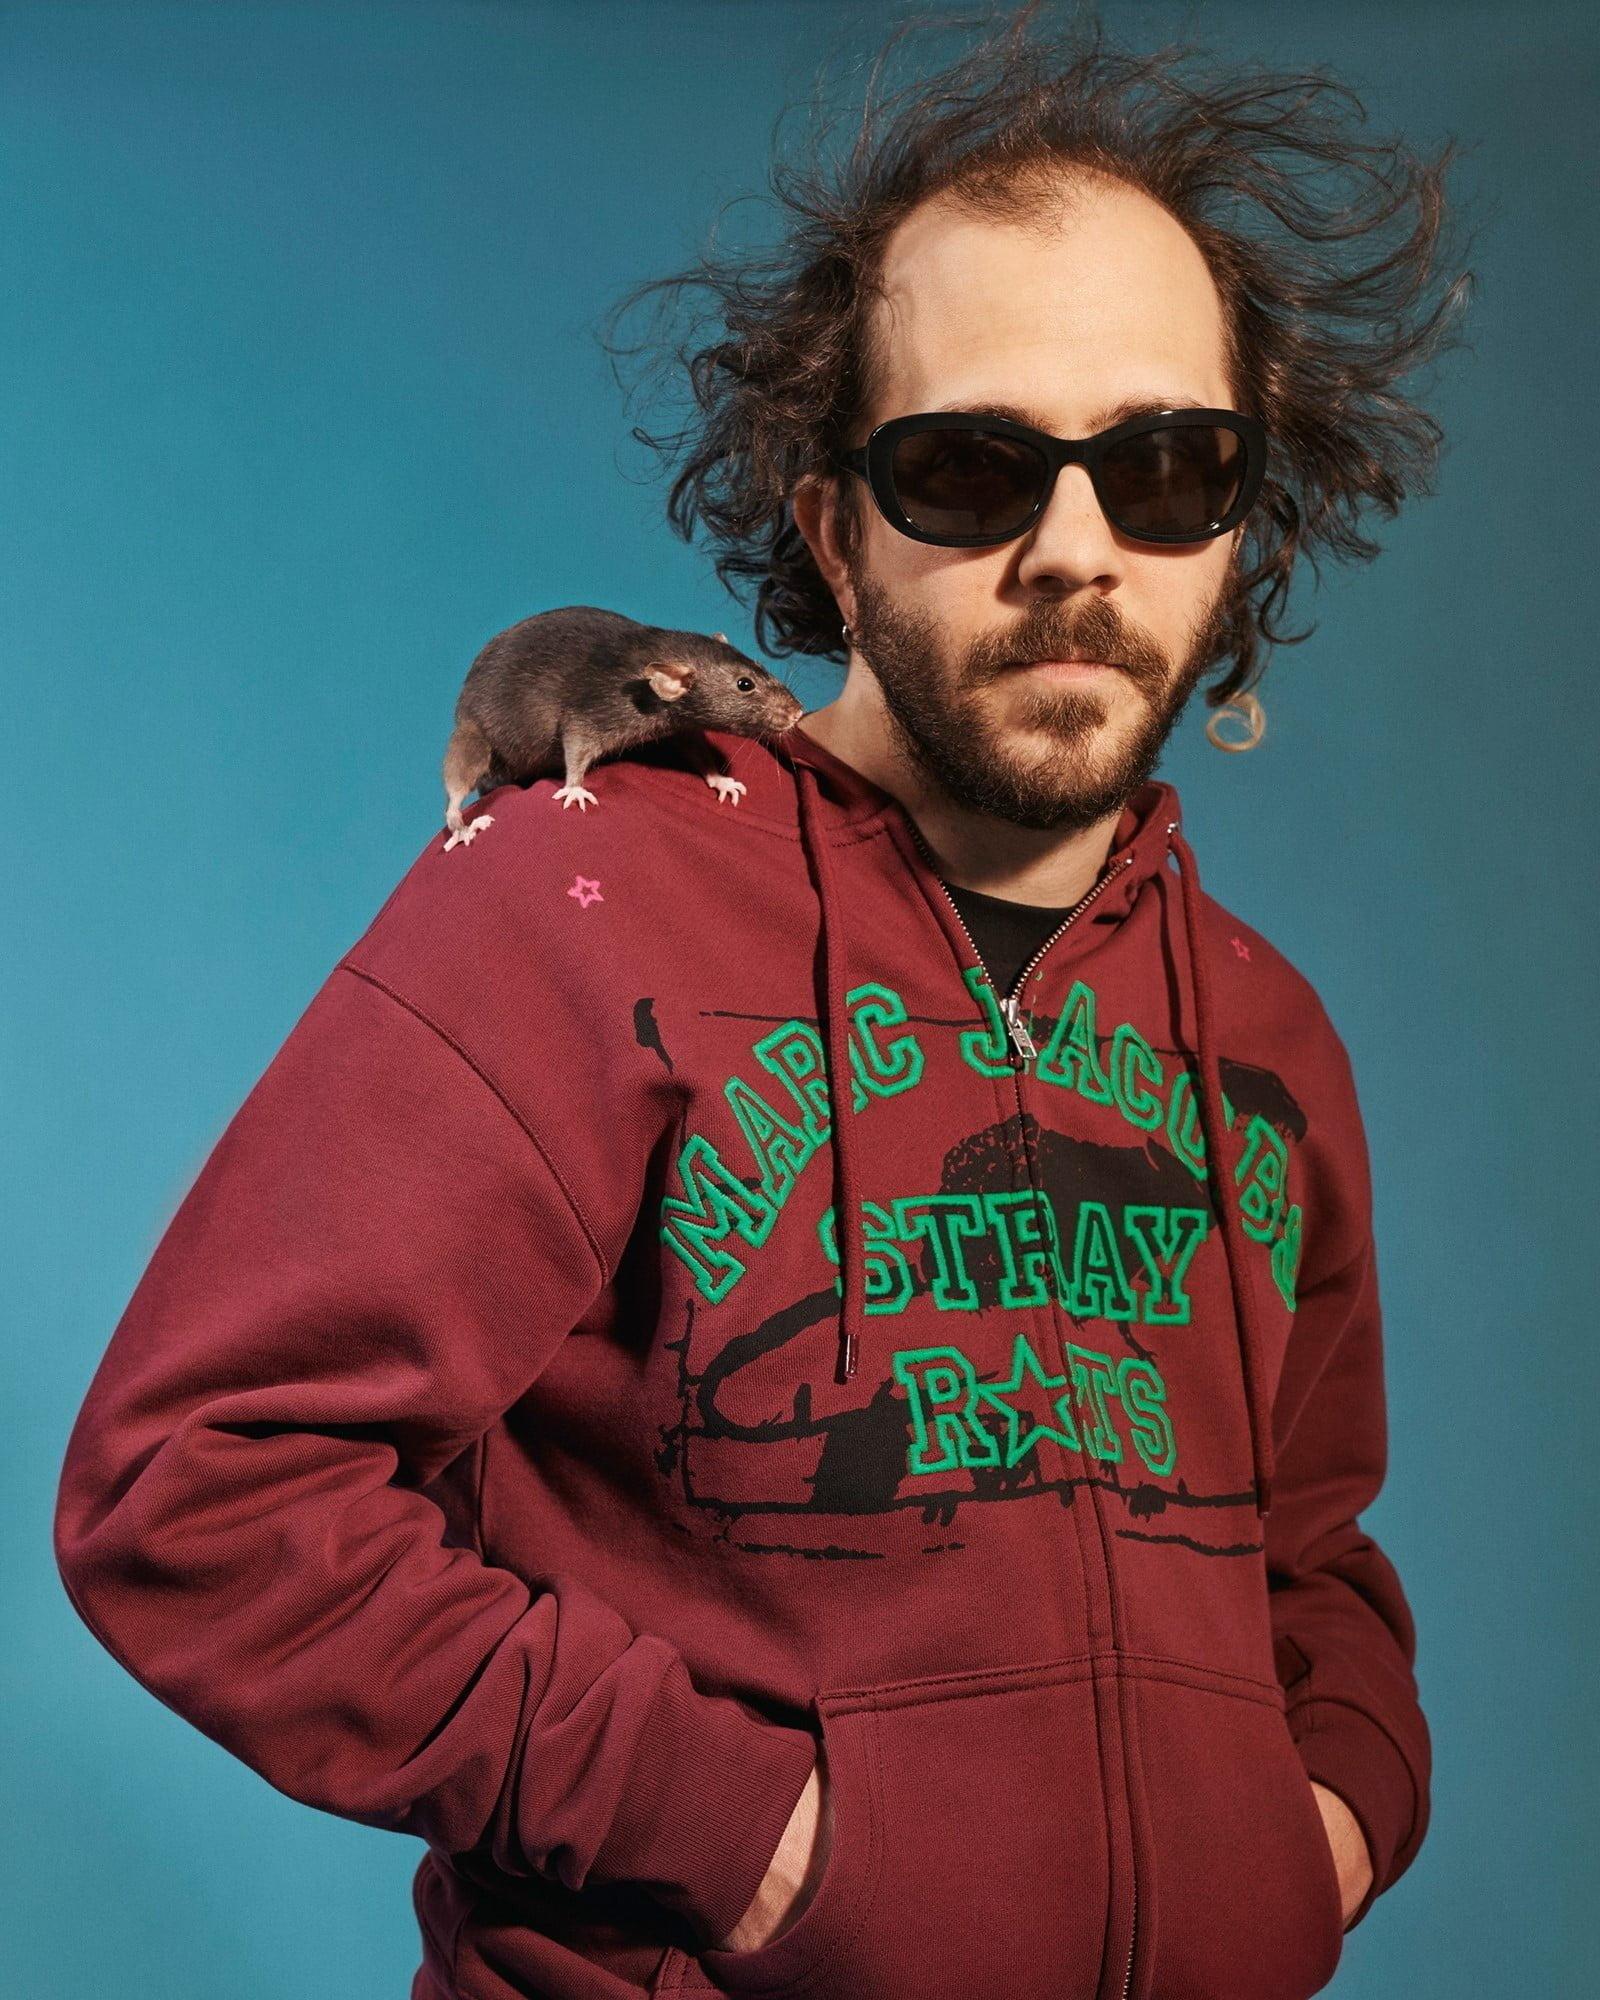 marc jacobs stray rats 4 Real Streetwear: Stray Rats 101